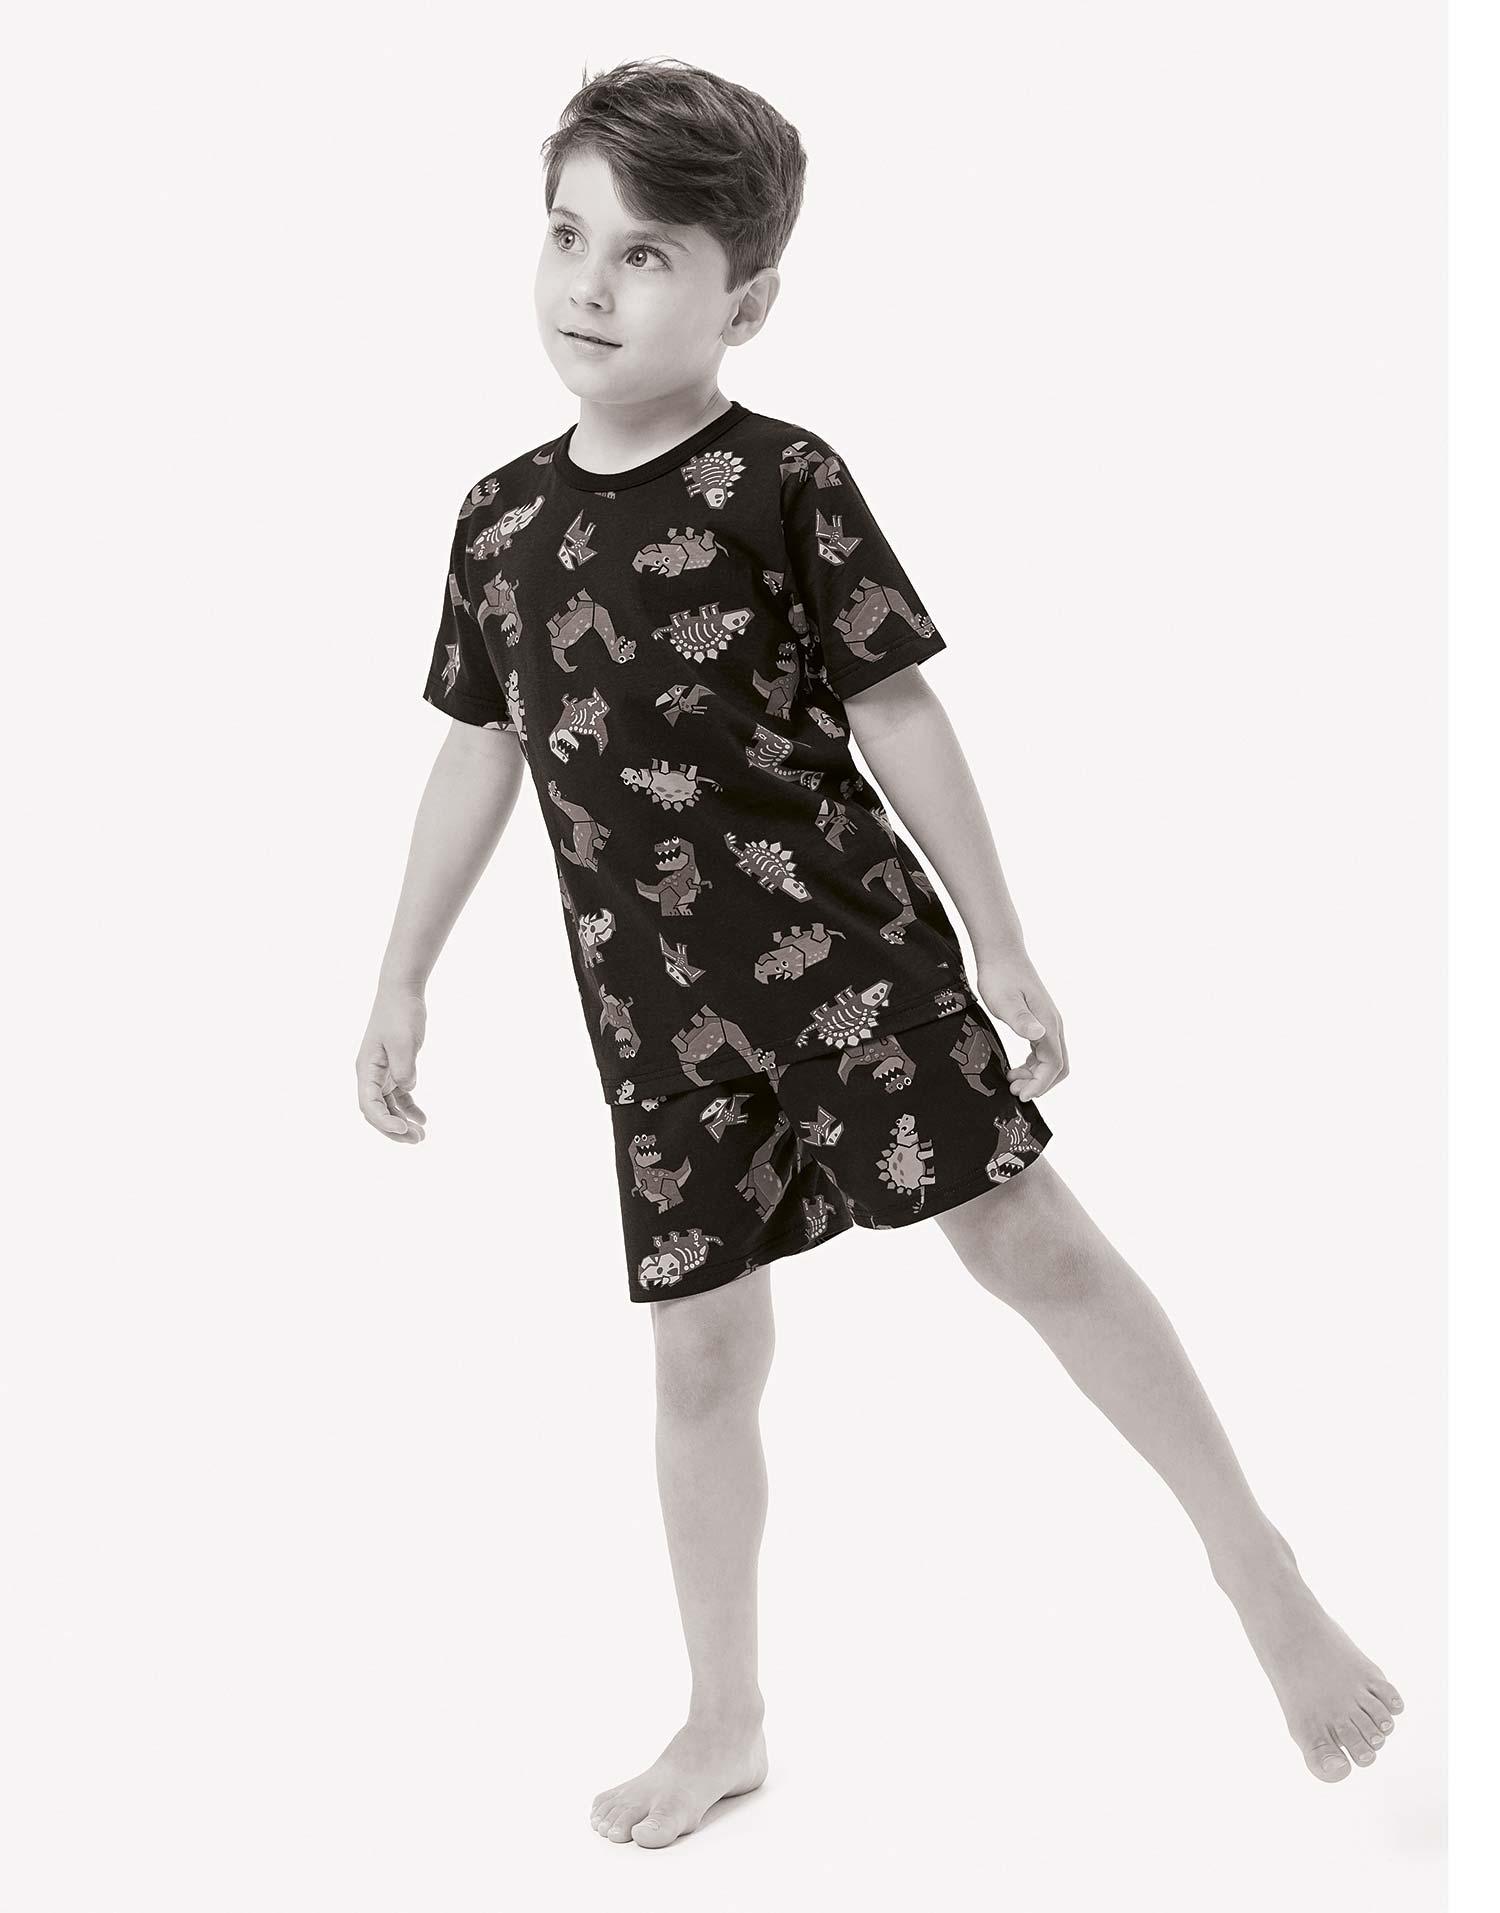 Pijama Infantil Masculino Verão Azul PitStop Malwee